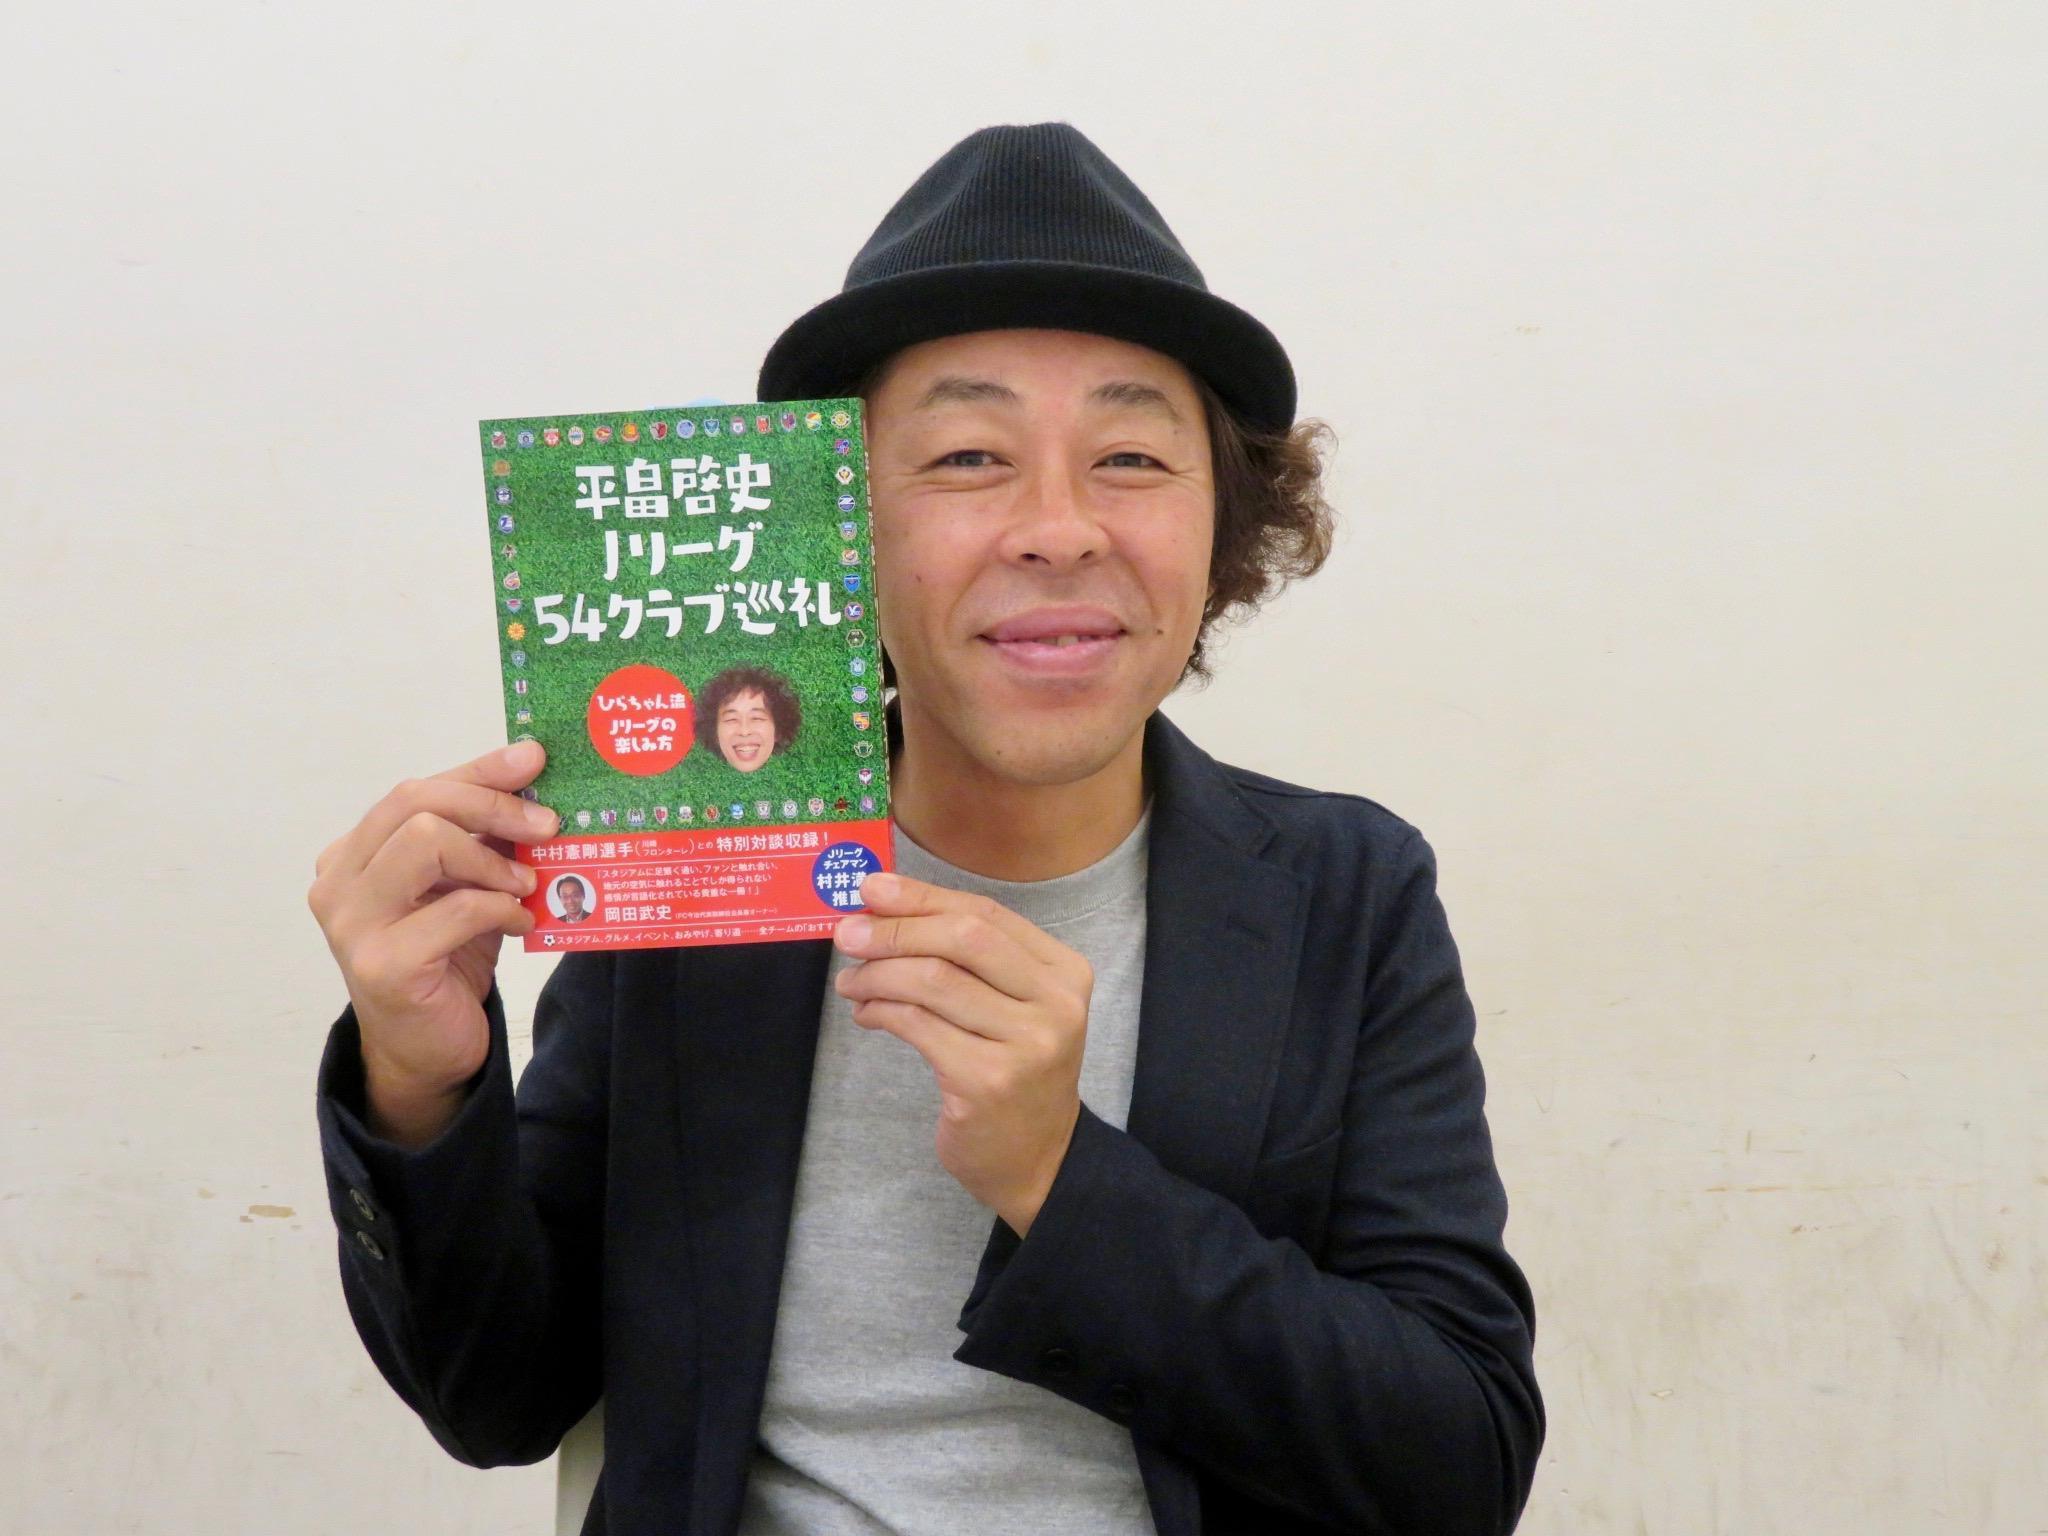 http://news.yoshimoto.co.jp/20181004203421-be76c2aaa903143b158a56508d1d0793df941692.jpg